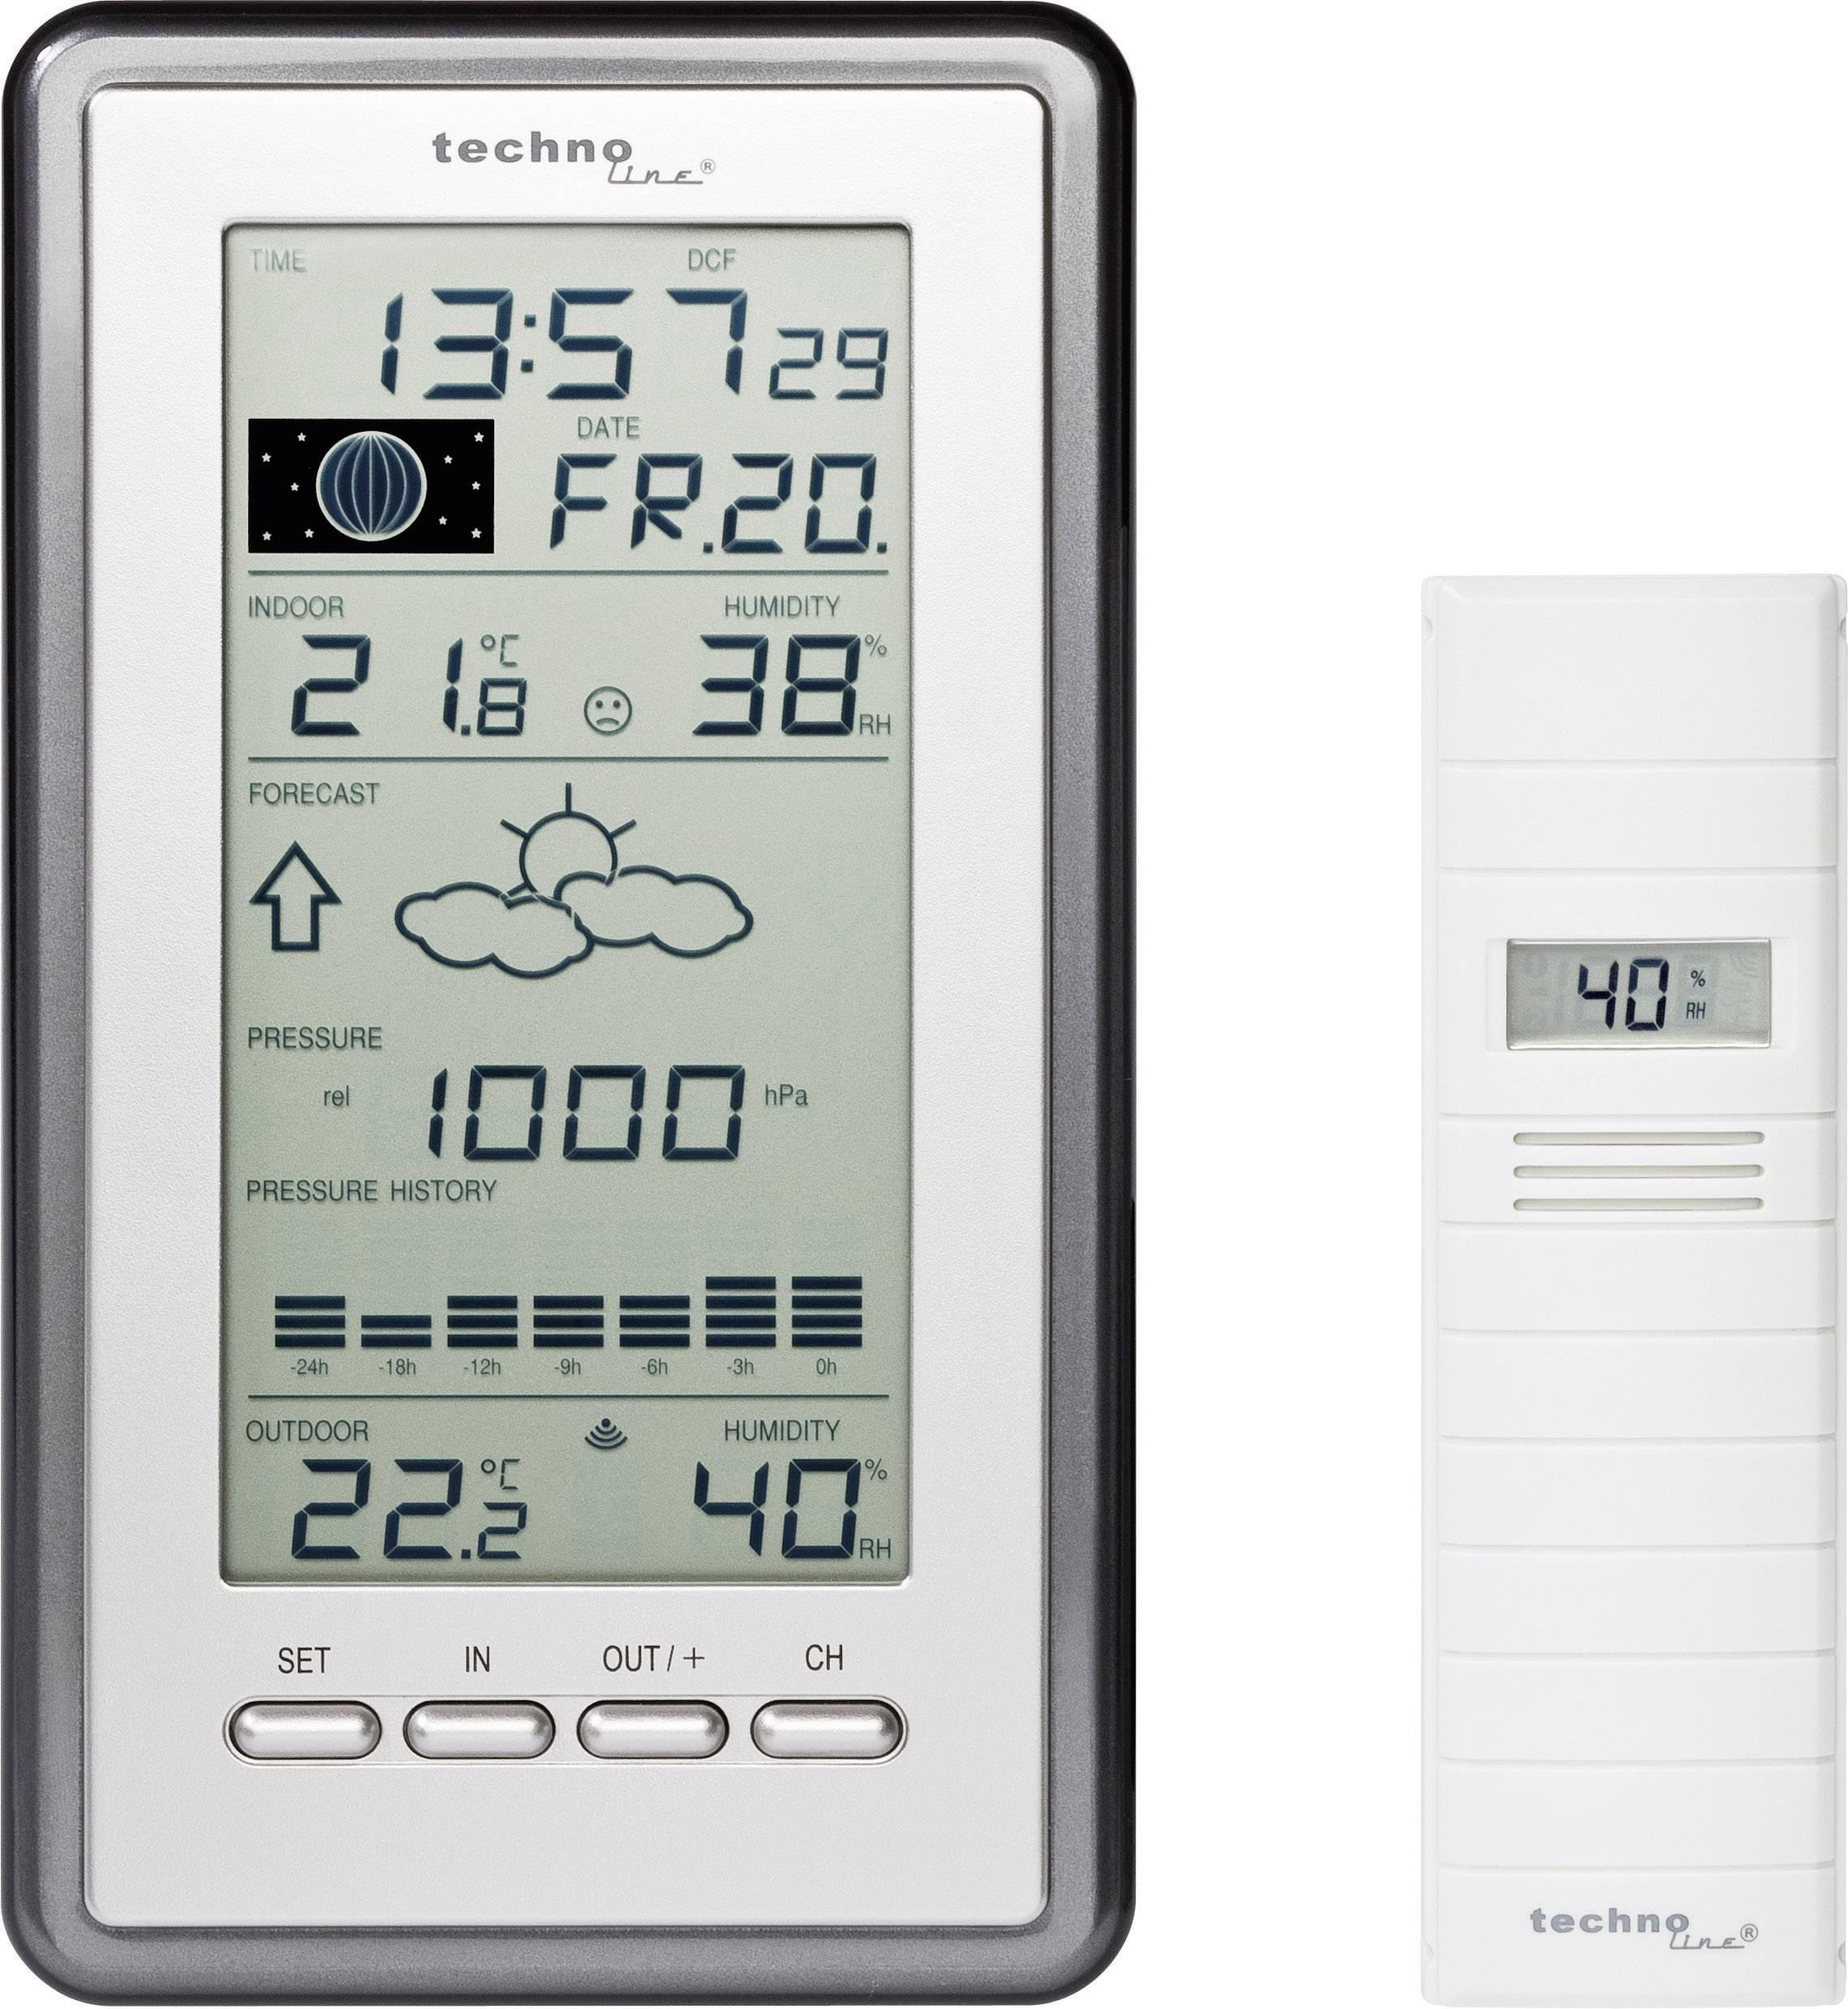 Digitálna bezdrôtová meteostanica Techno Line WS 9040 IT Max. dosah 100 m